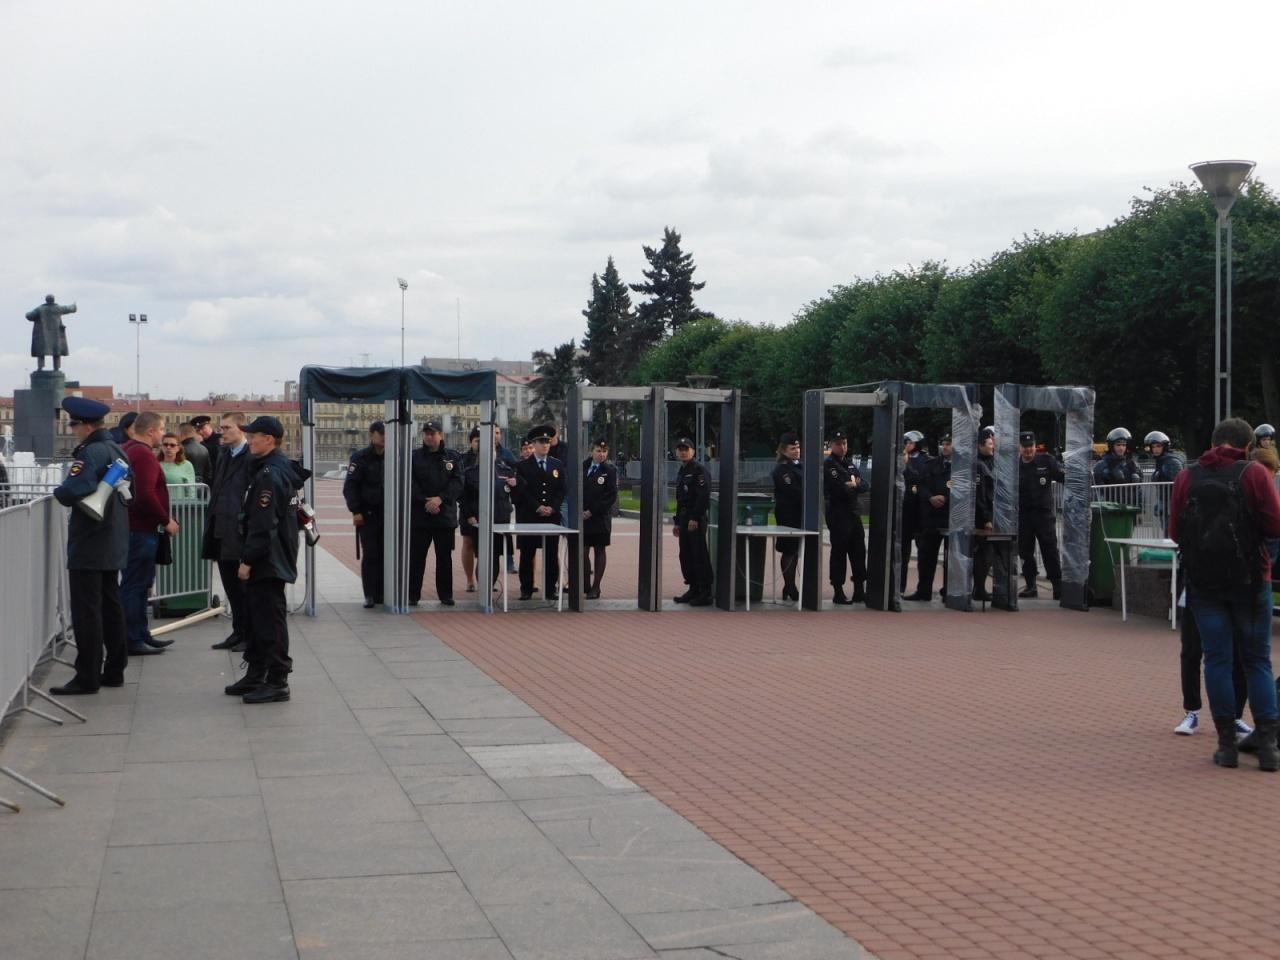 фото ЗакС политика В Петербурге на акцию против изменения климата пришли 50 активистов и сотни силовиков